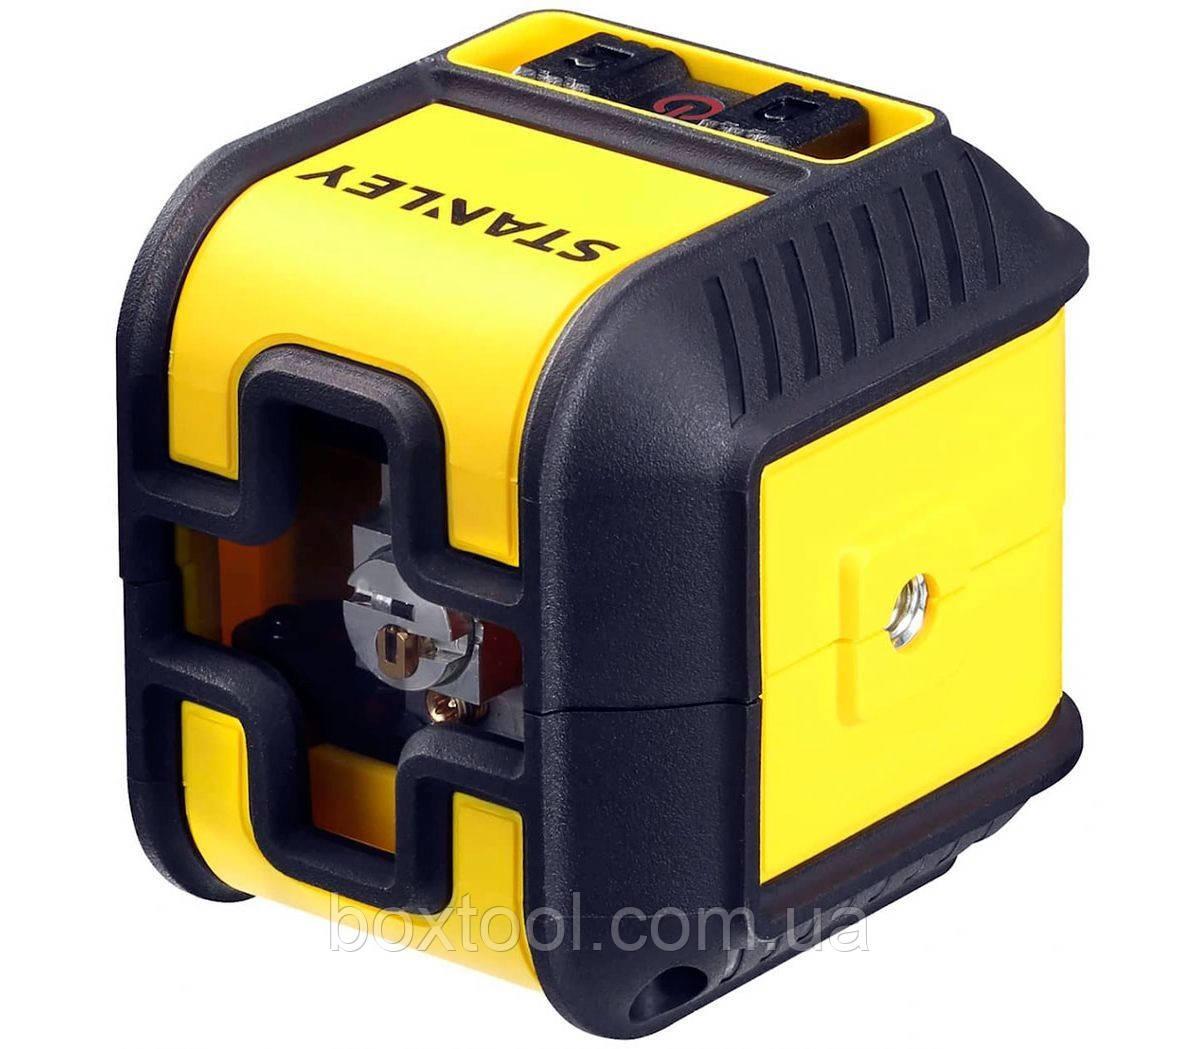 Уровень лазерный STANLEY STHT77499-1